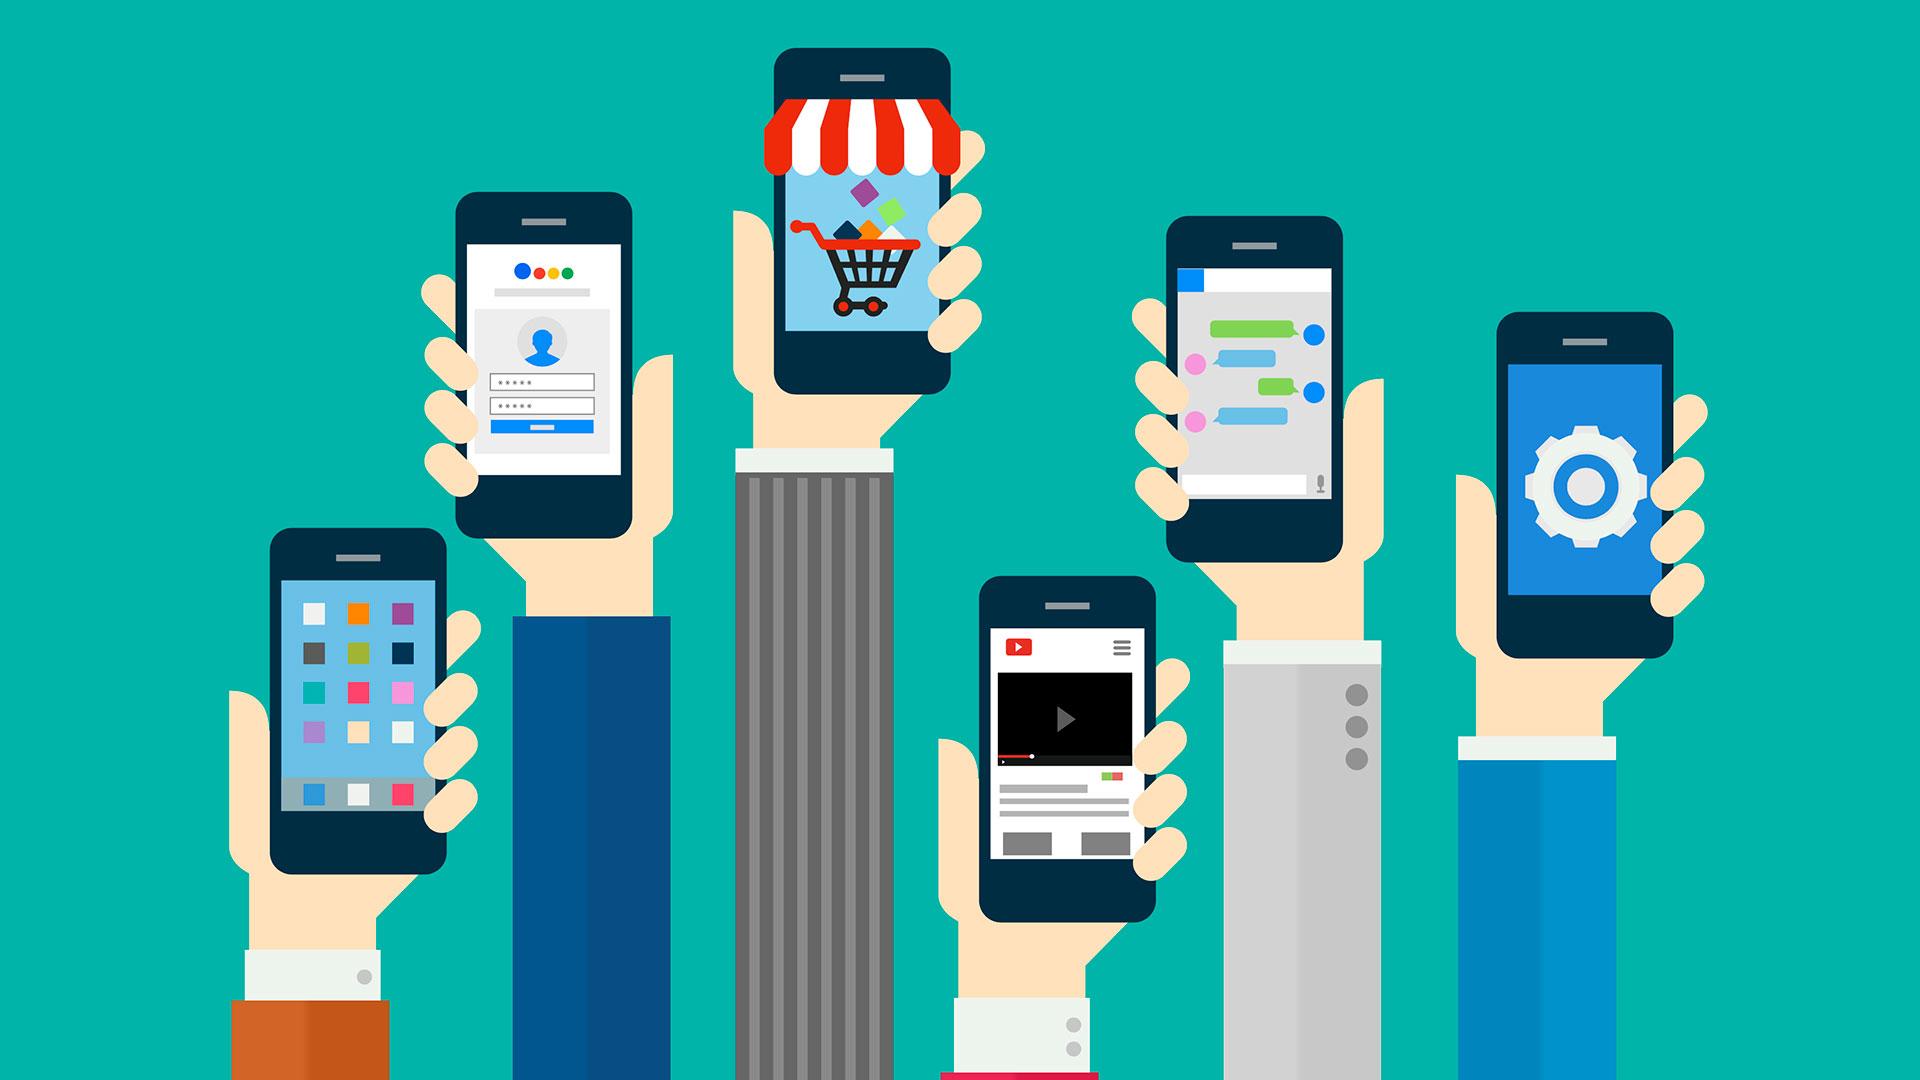 sites otimizados para dispositivos móveis